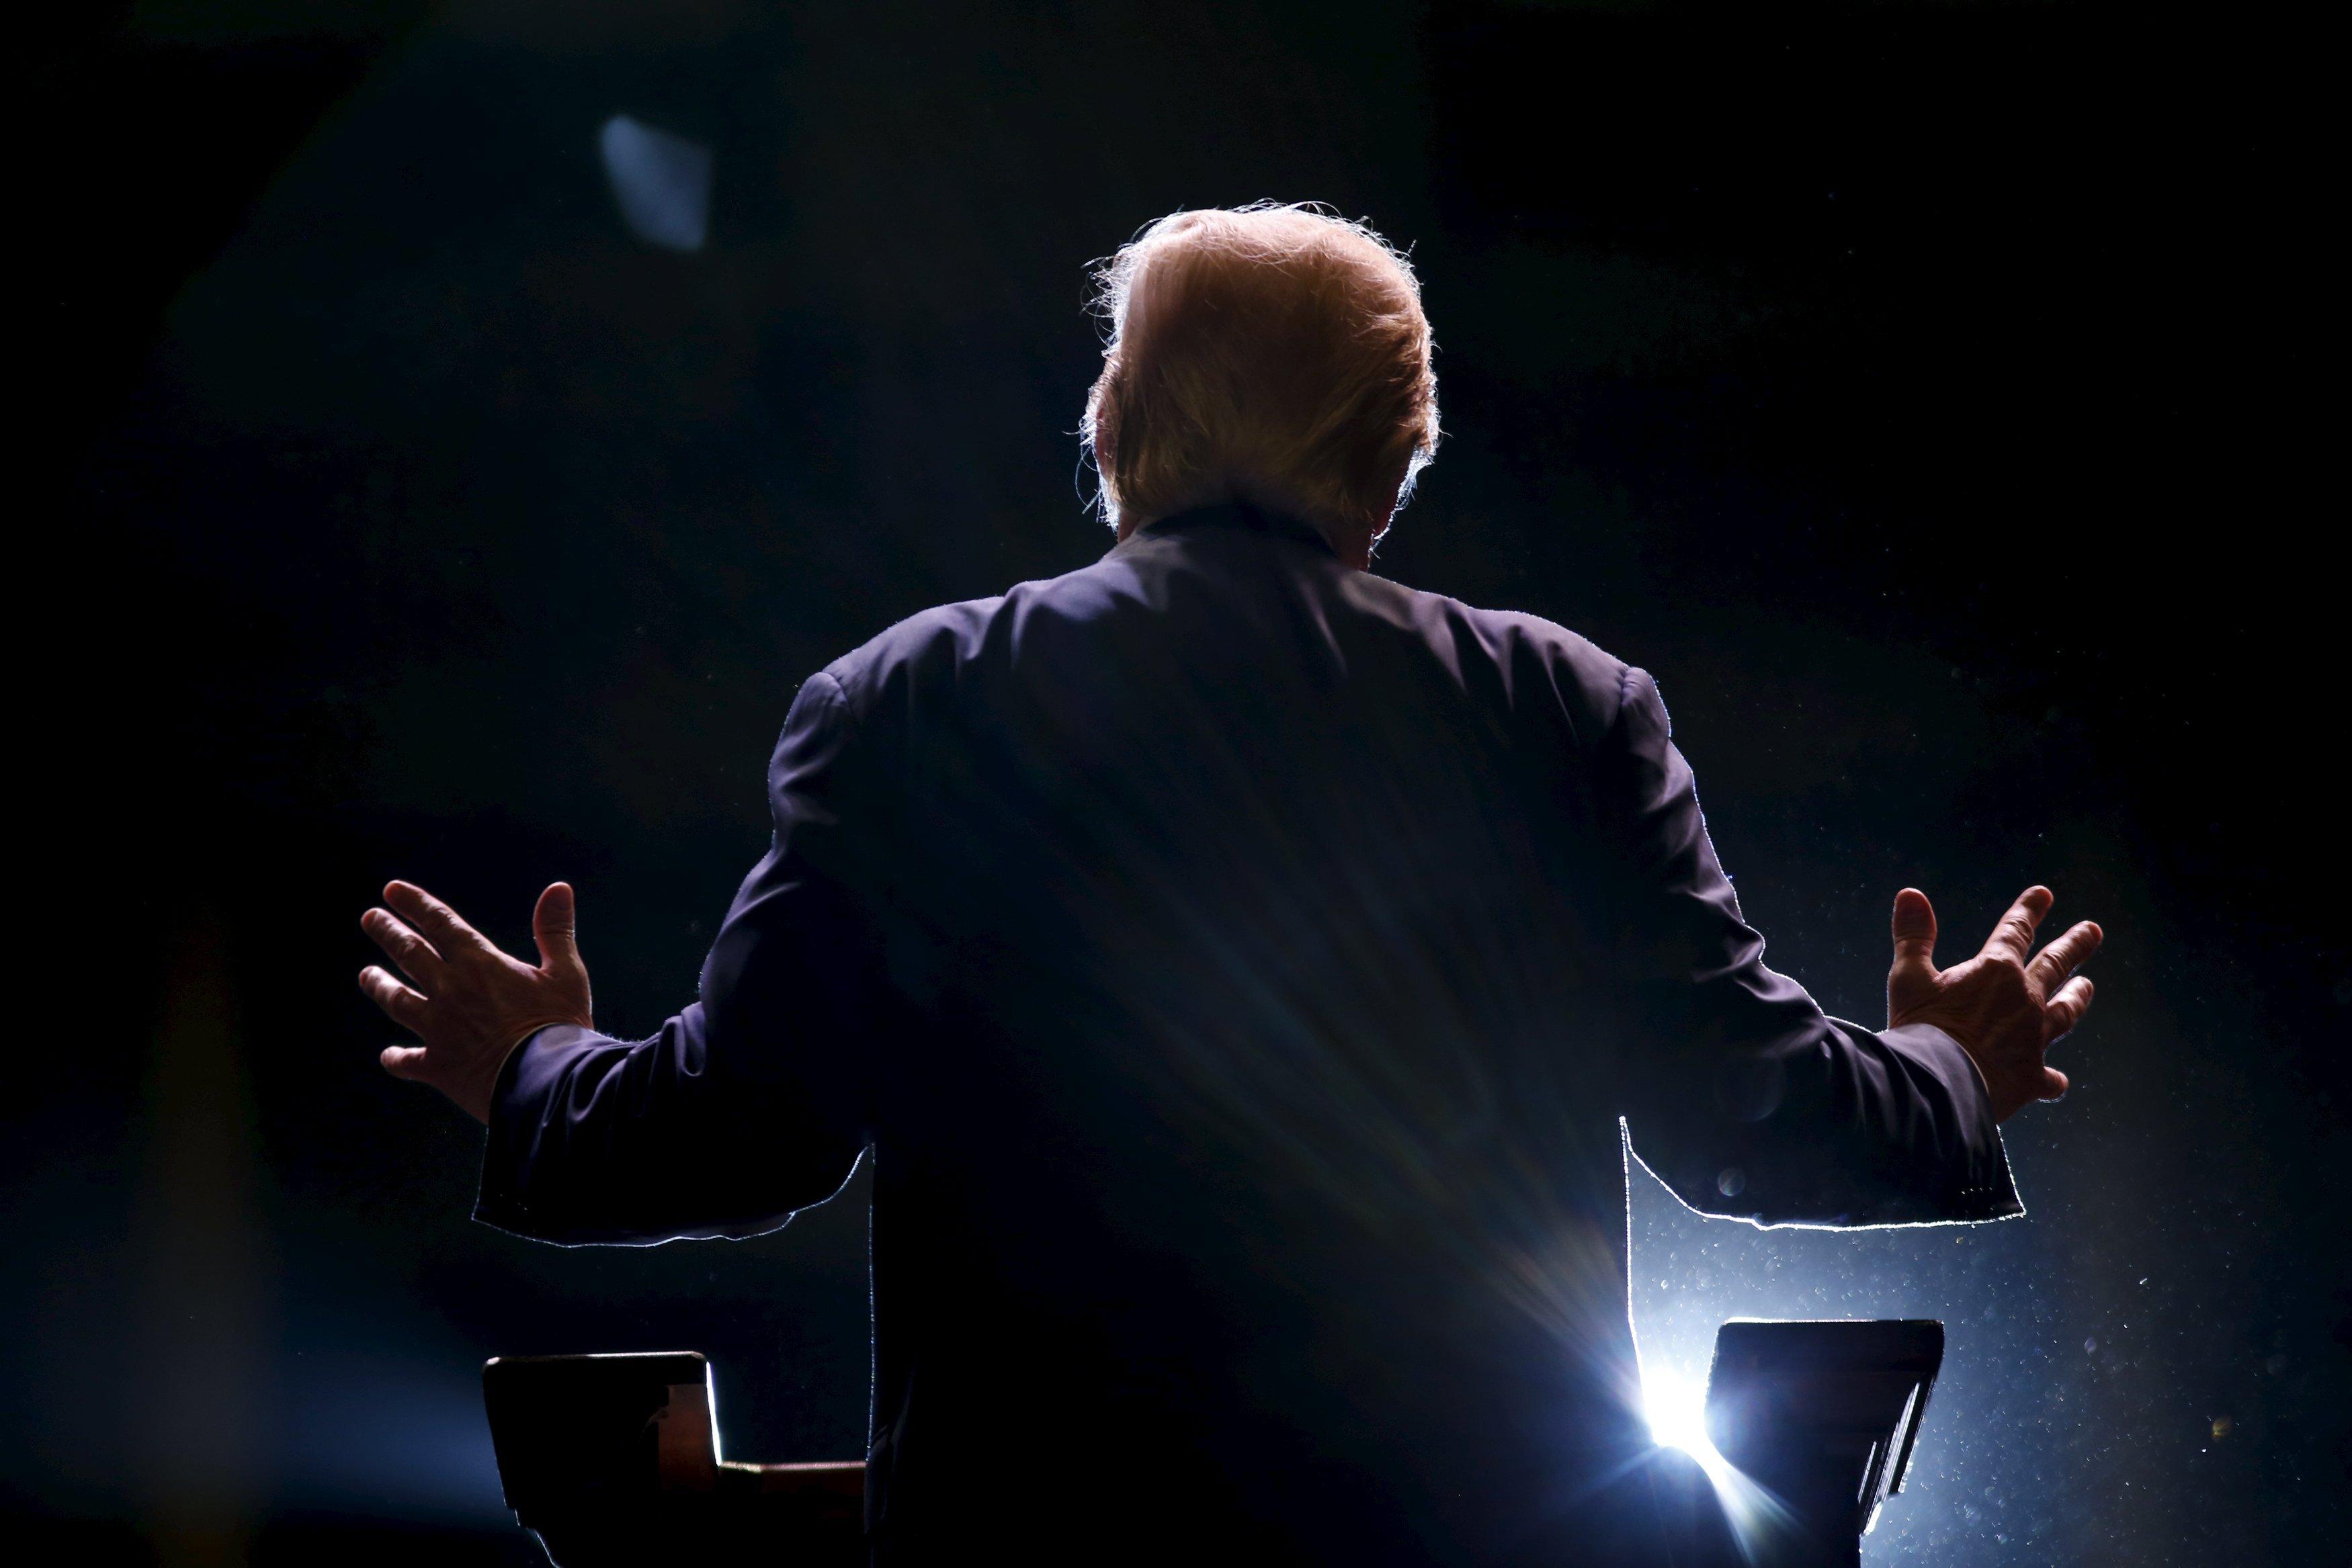 Donald Trump addresses a Trump for President campaign rally in Macon, GA on Nov. 30, 2015.